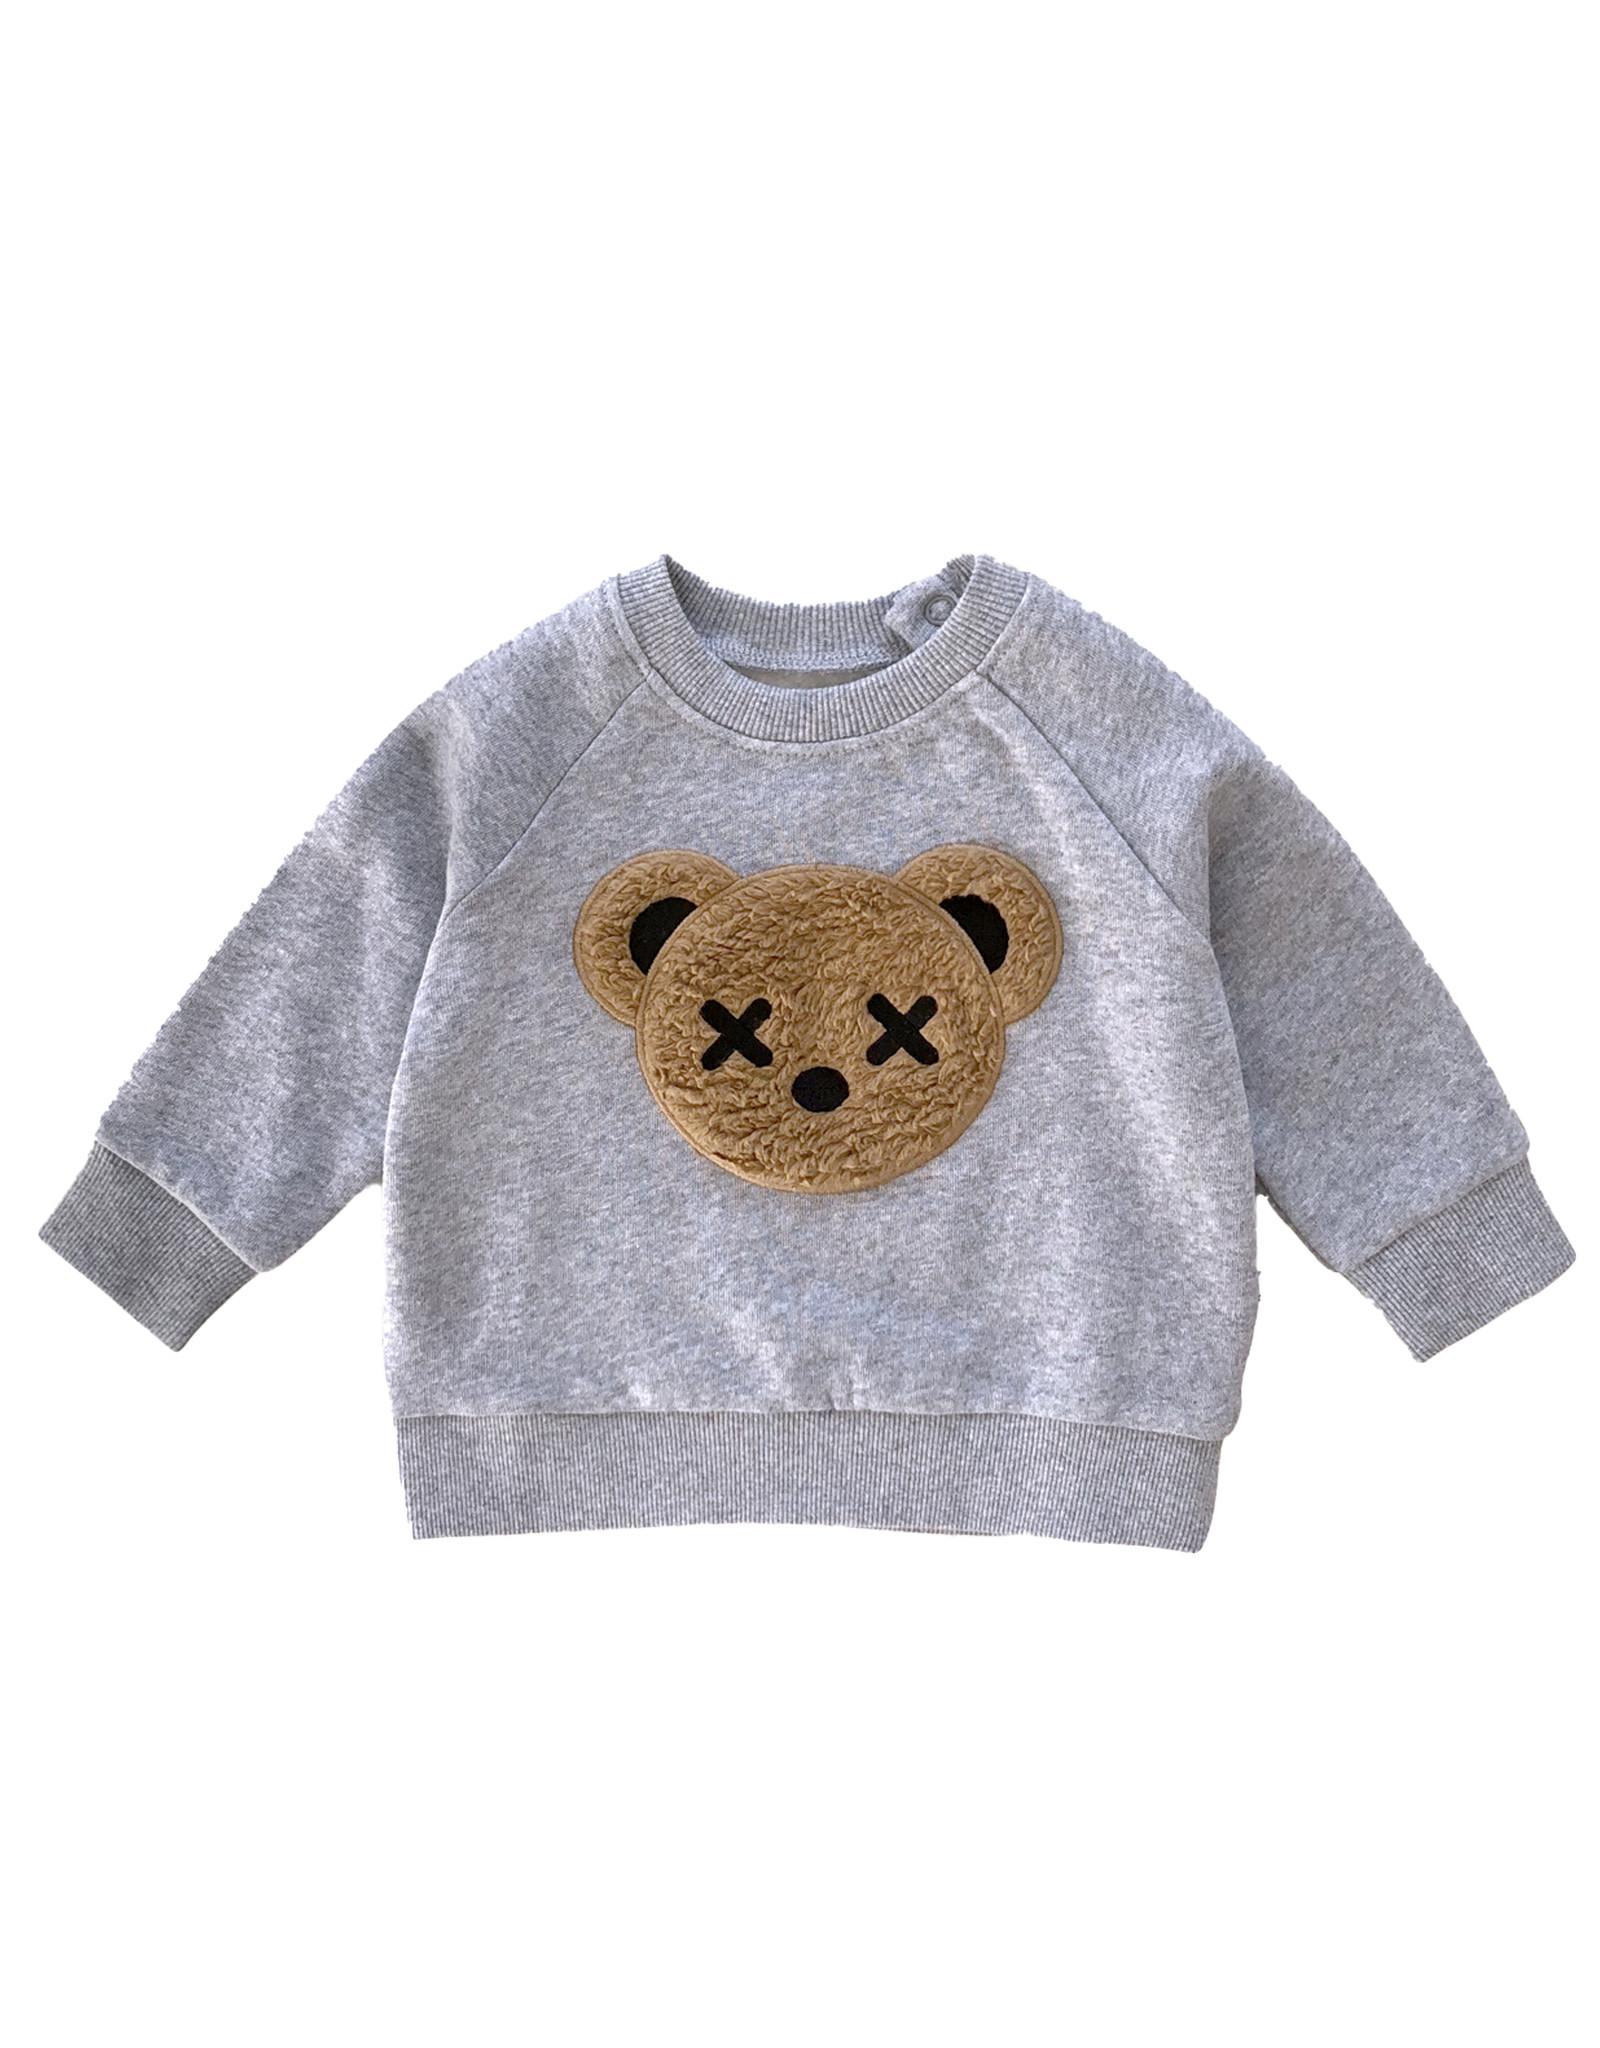 Huxbaby HuxBear Applique Sweatshirt